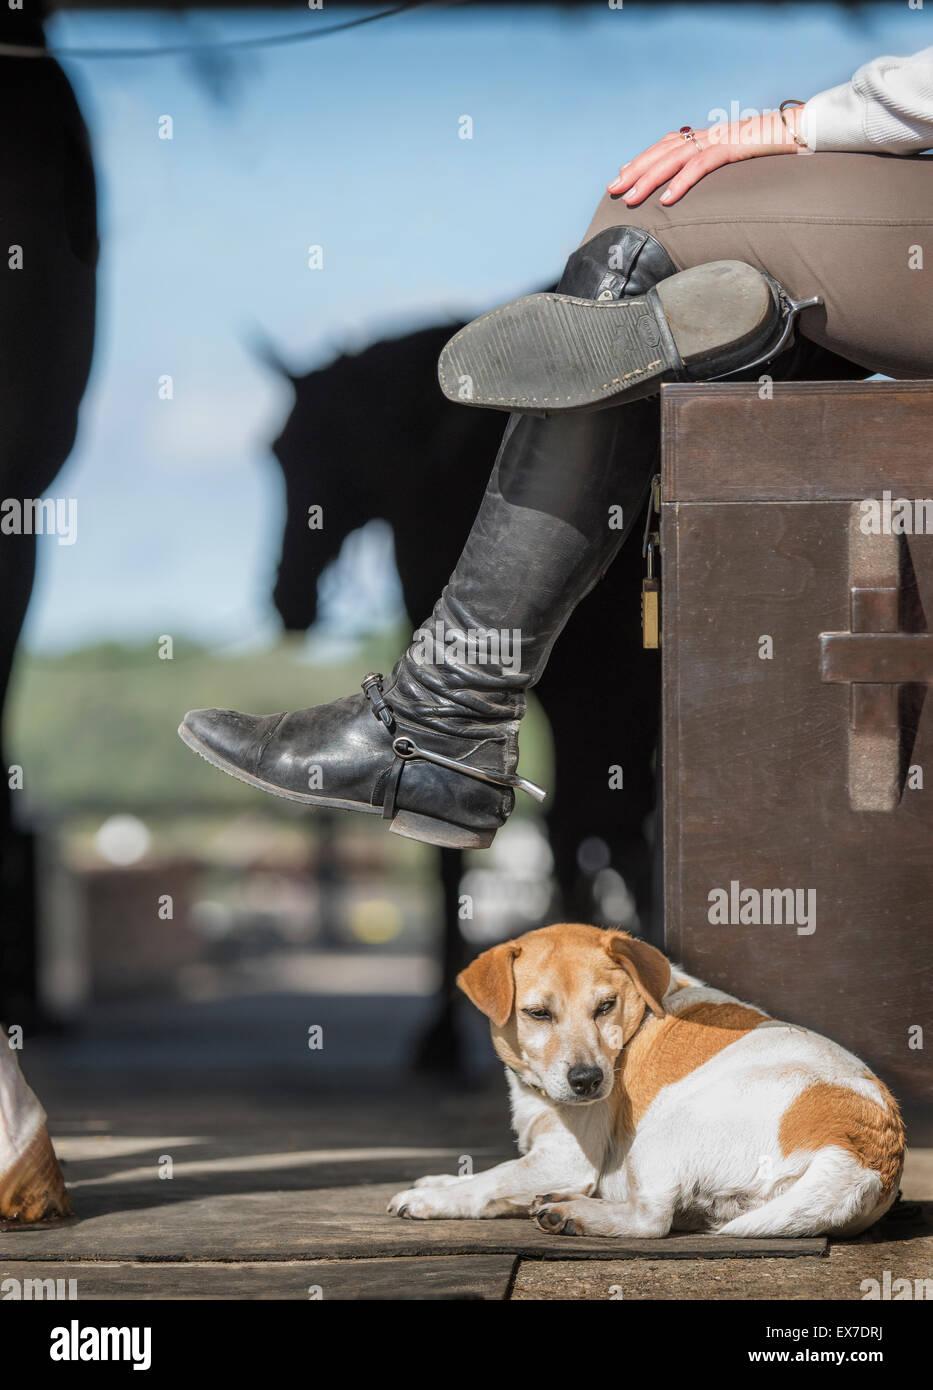 dog and horse barn activity - Stock Image